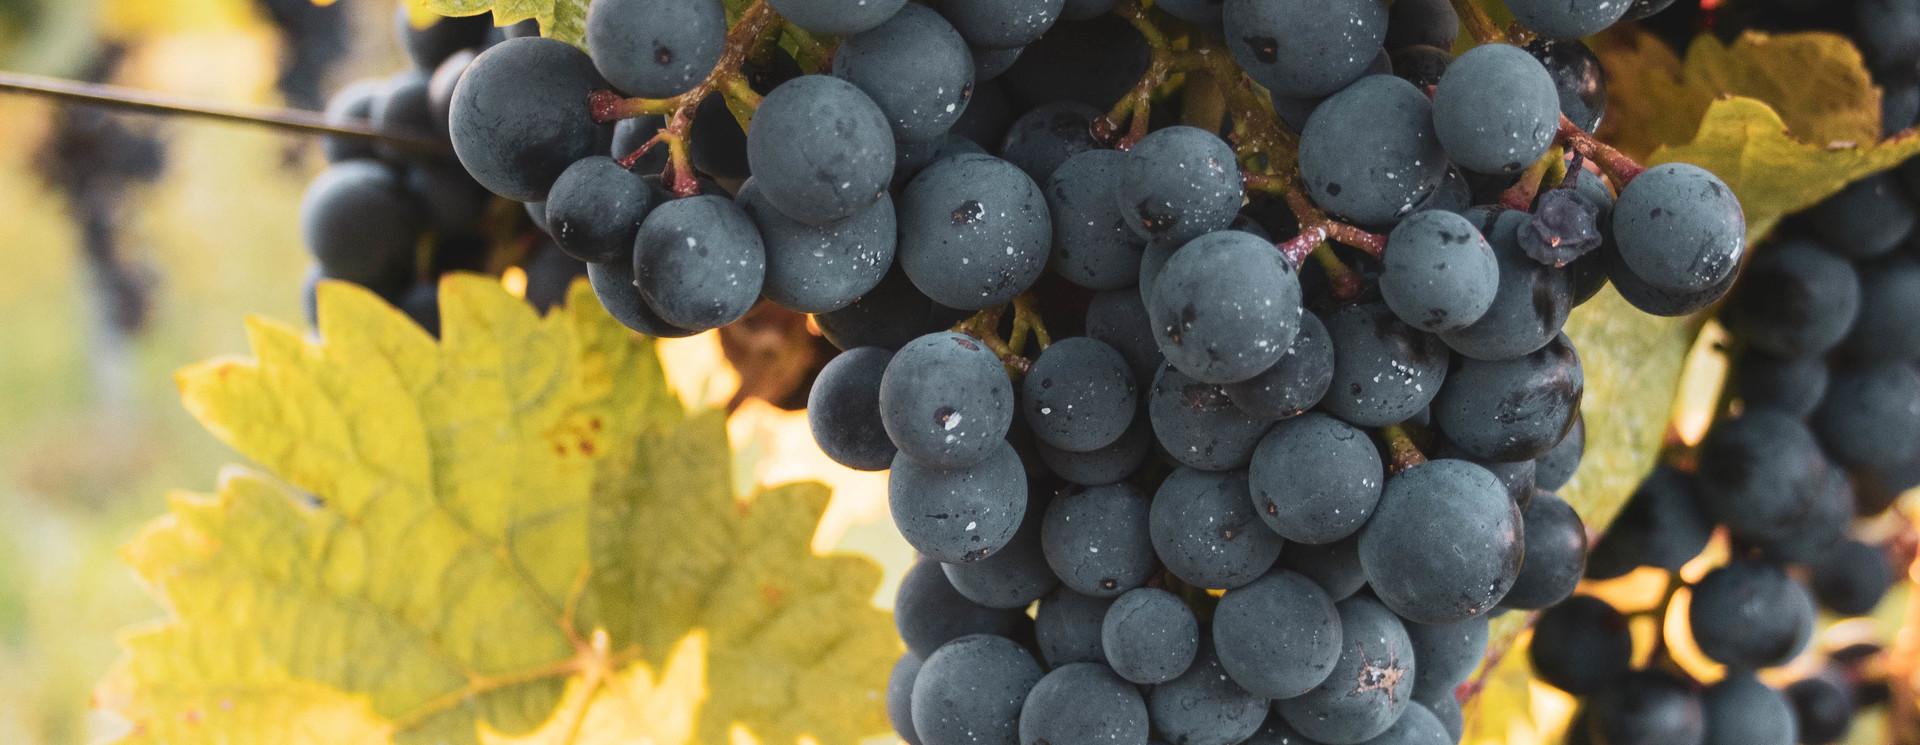 Limburgse mousserende wijnen